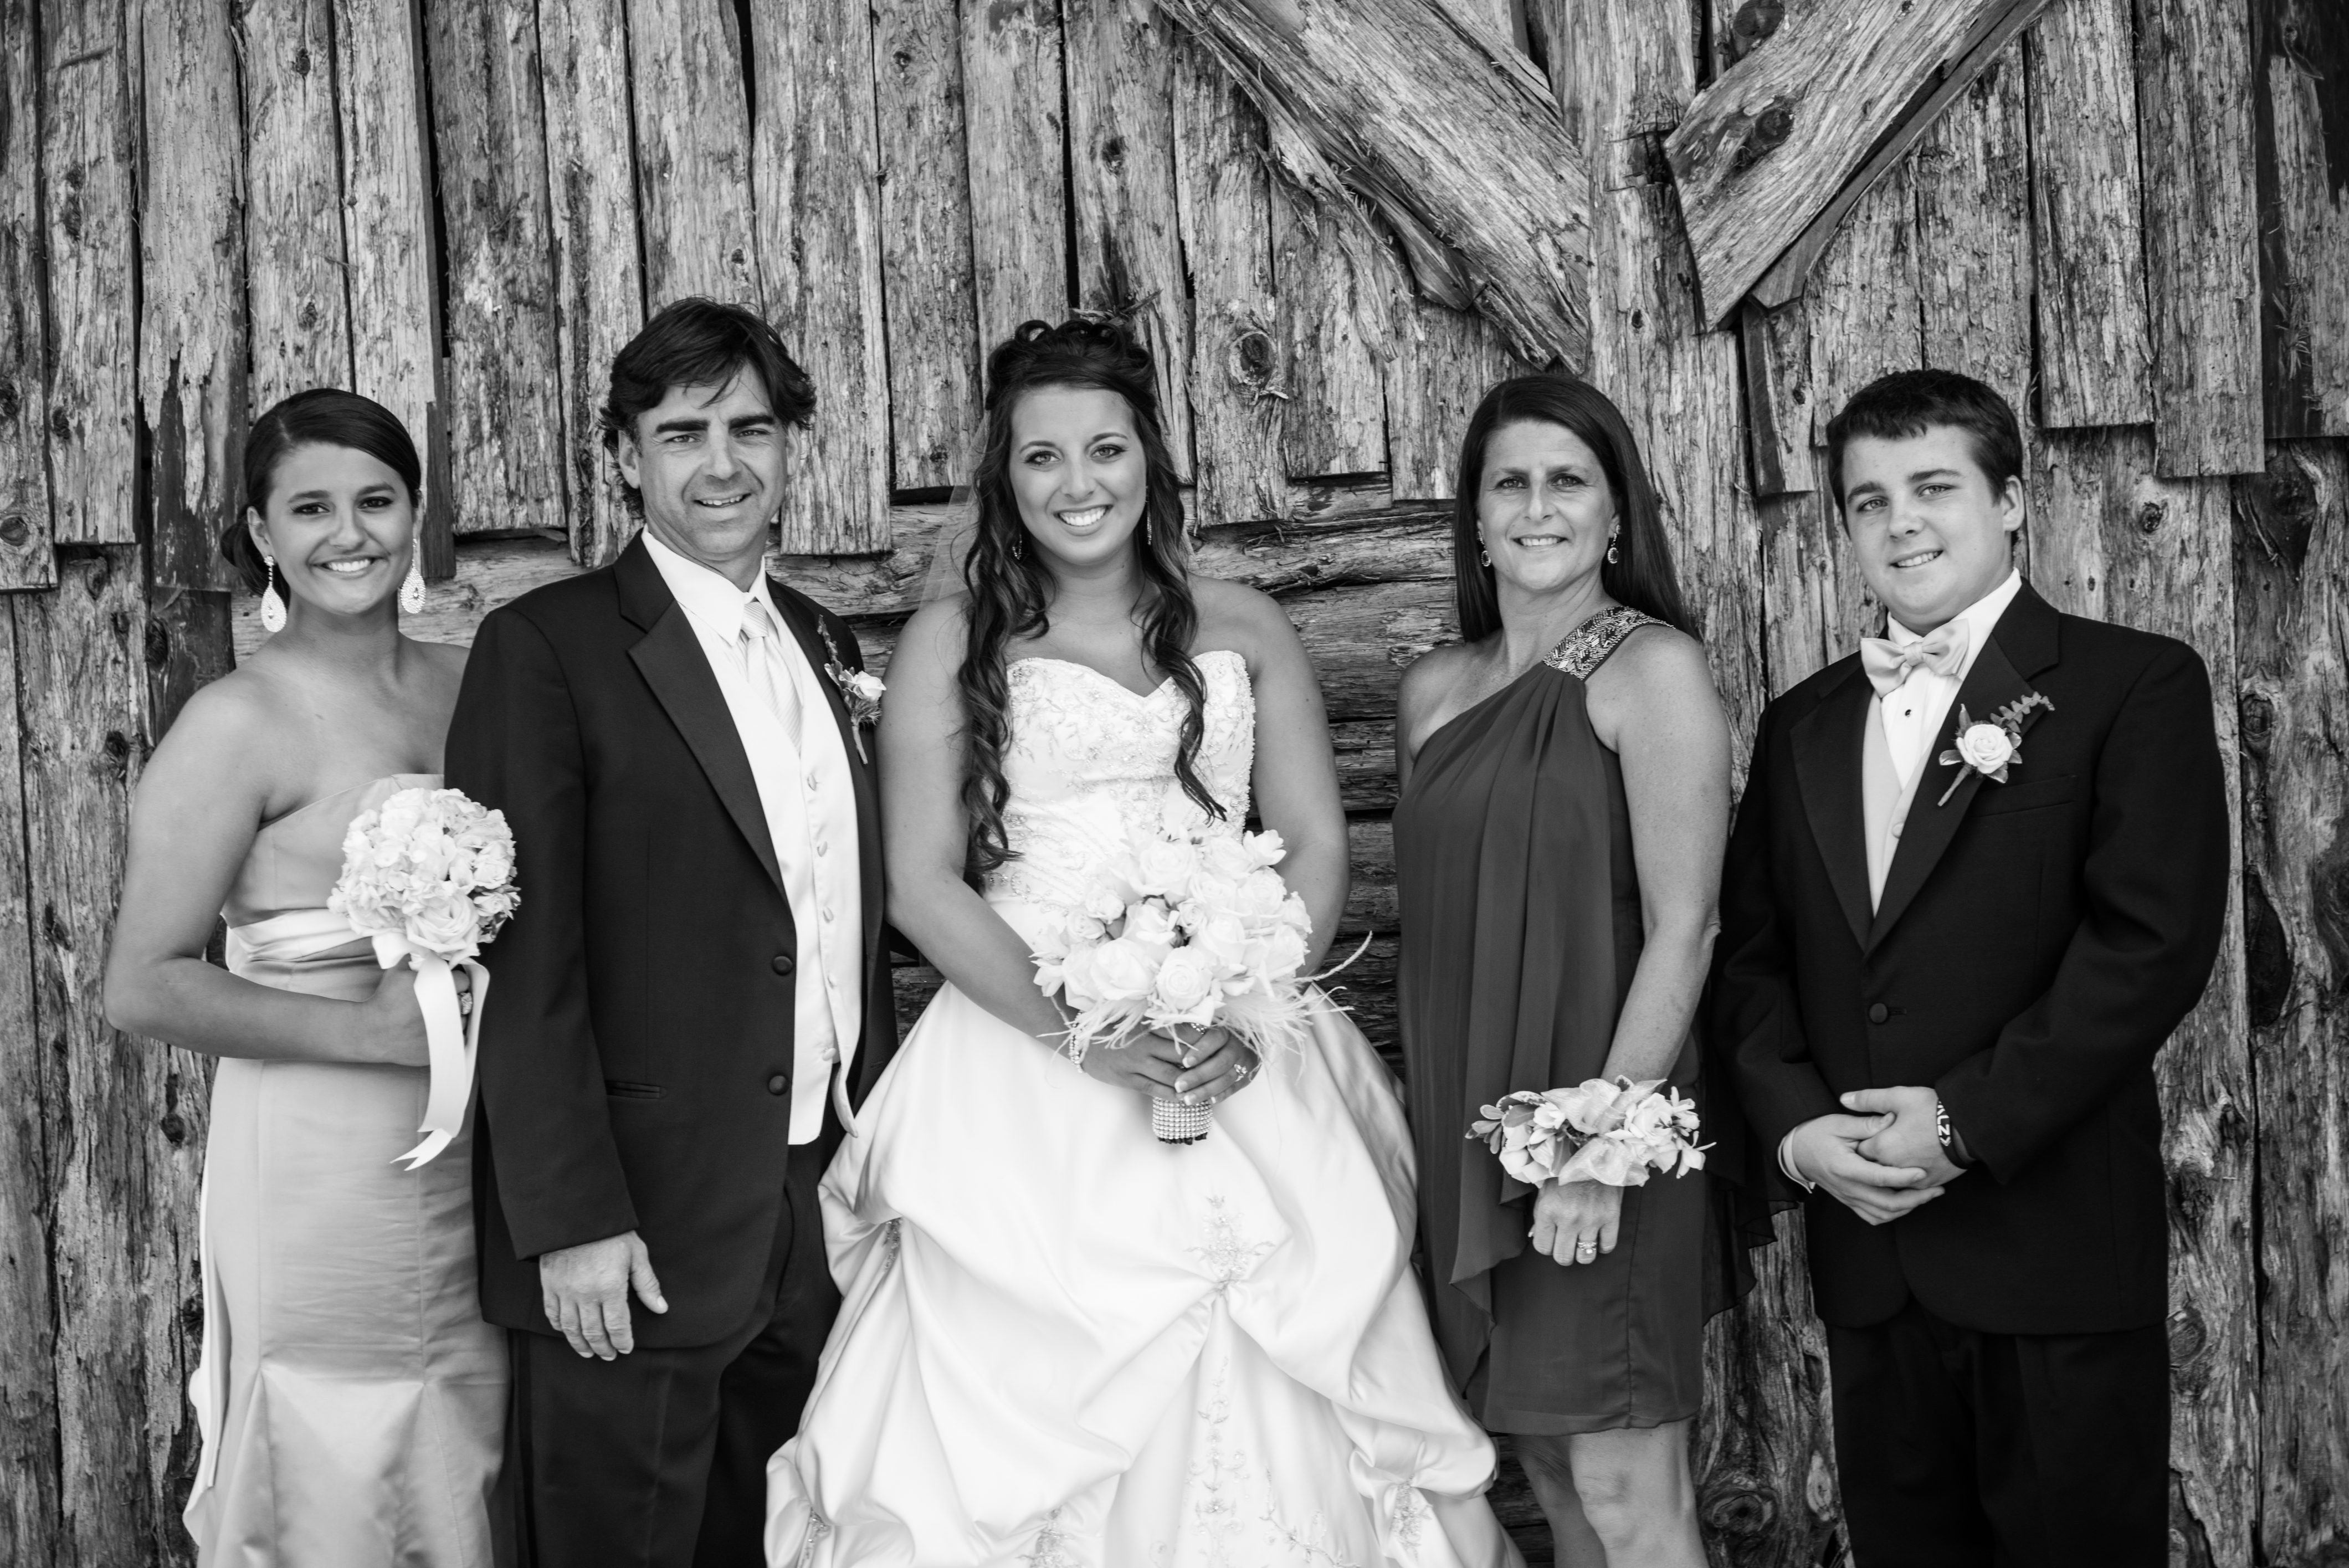 Matt-Blakely-wedding-nashville-tn-legacy-farms-697